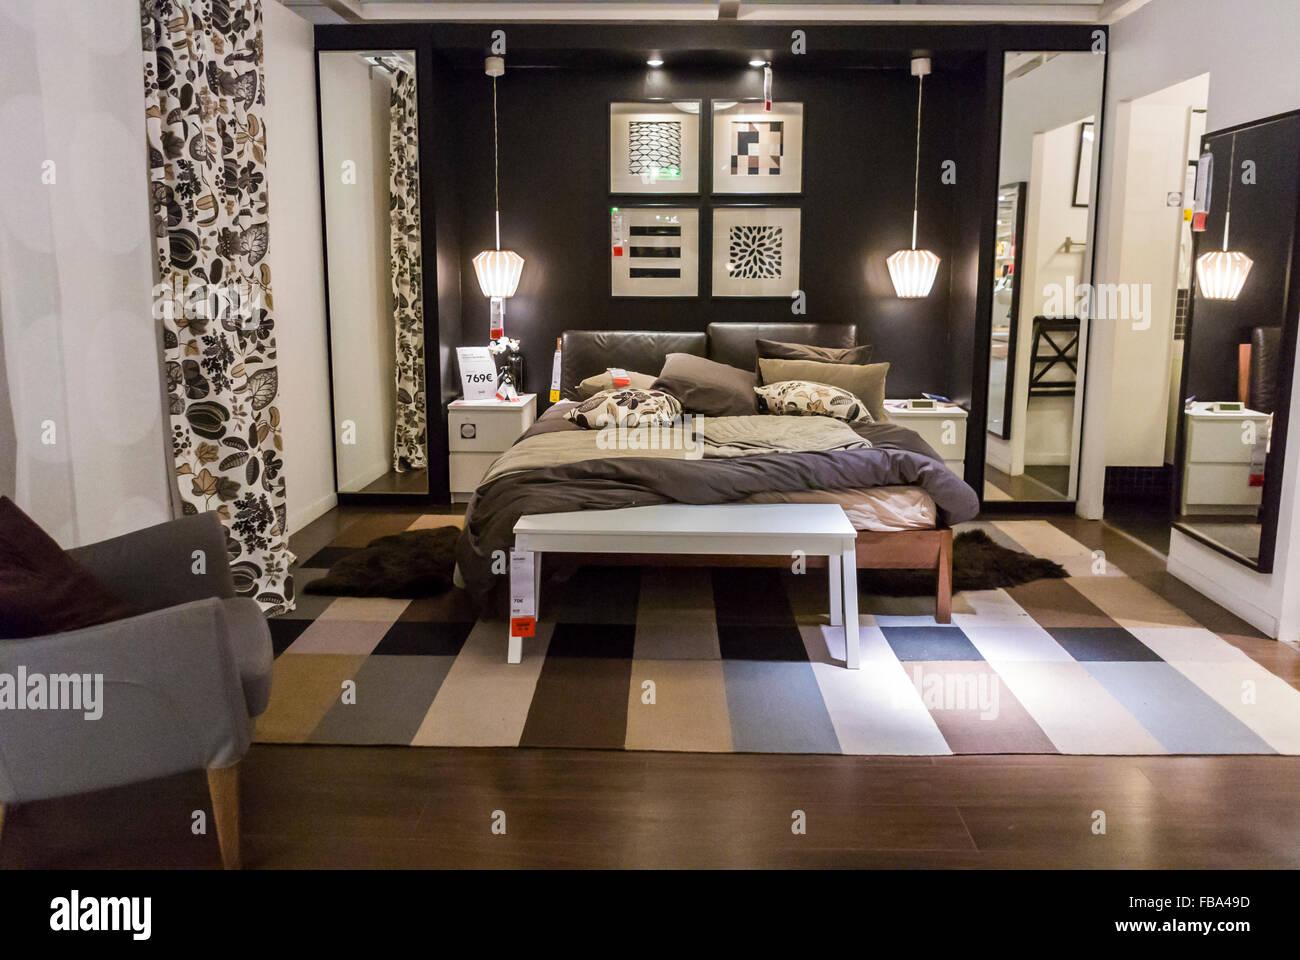 Chambre Coucher Moderne Ikea | Chambre A Coucher Ikea Onestopcolorado